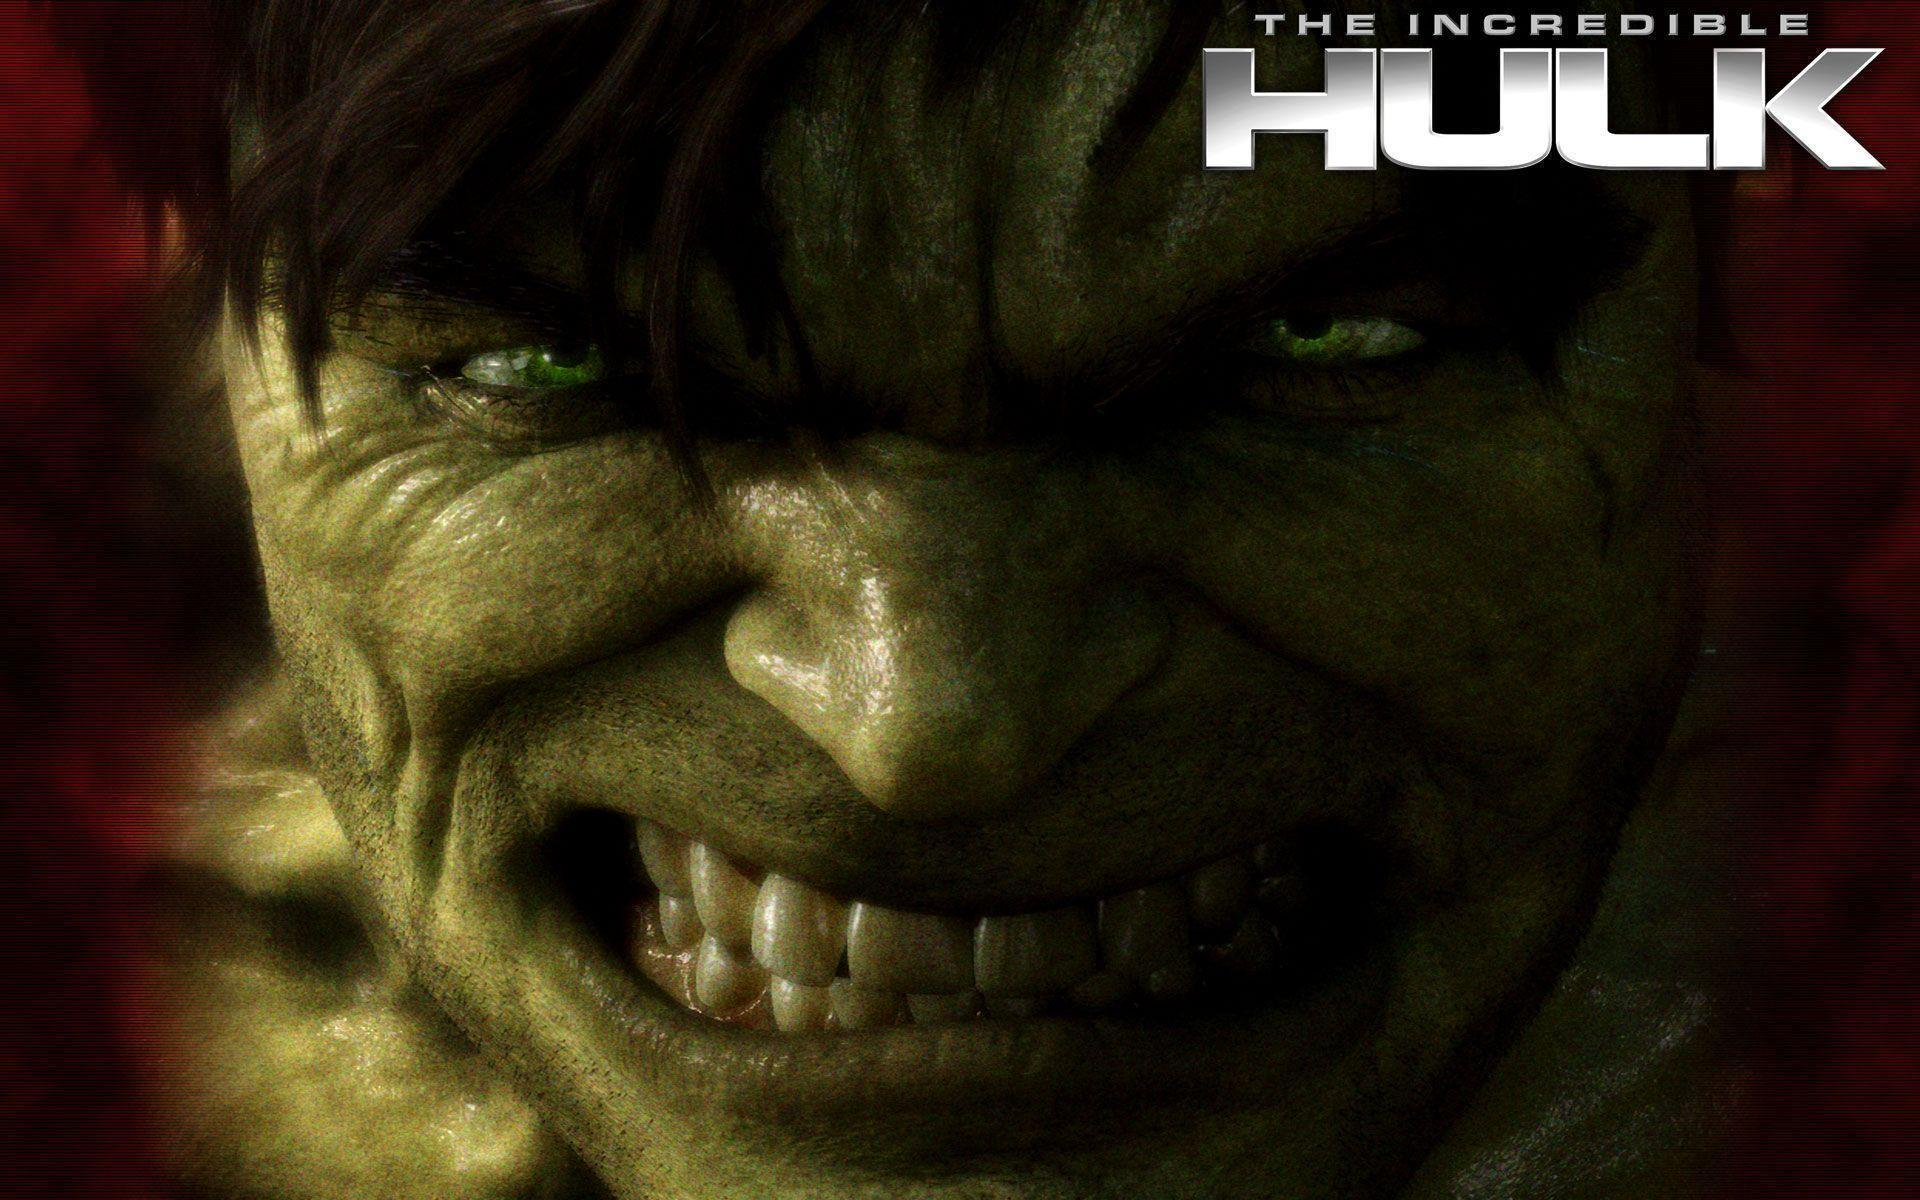 Incredible Hulk Wallpapers Movie Photo Wallpaper